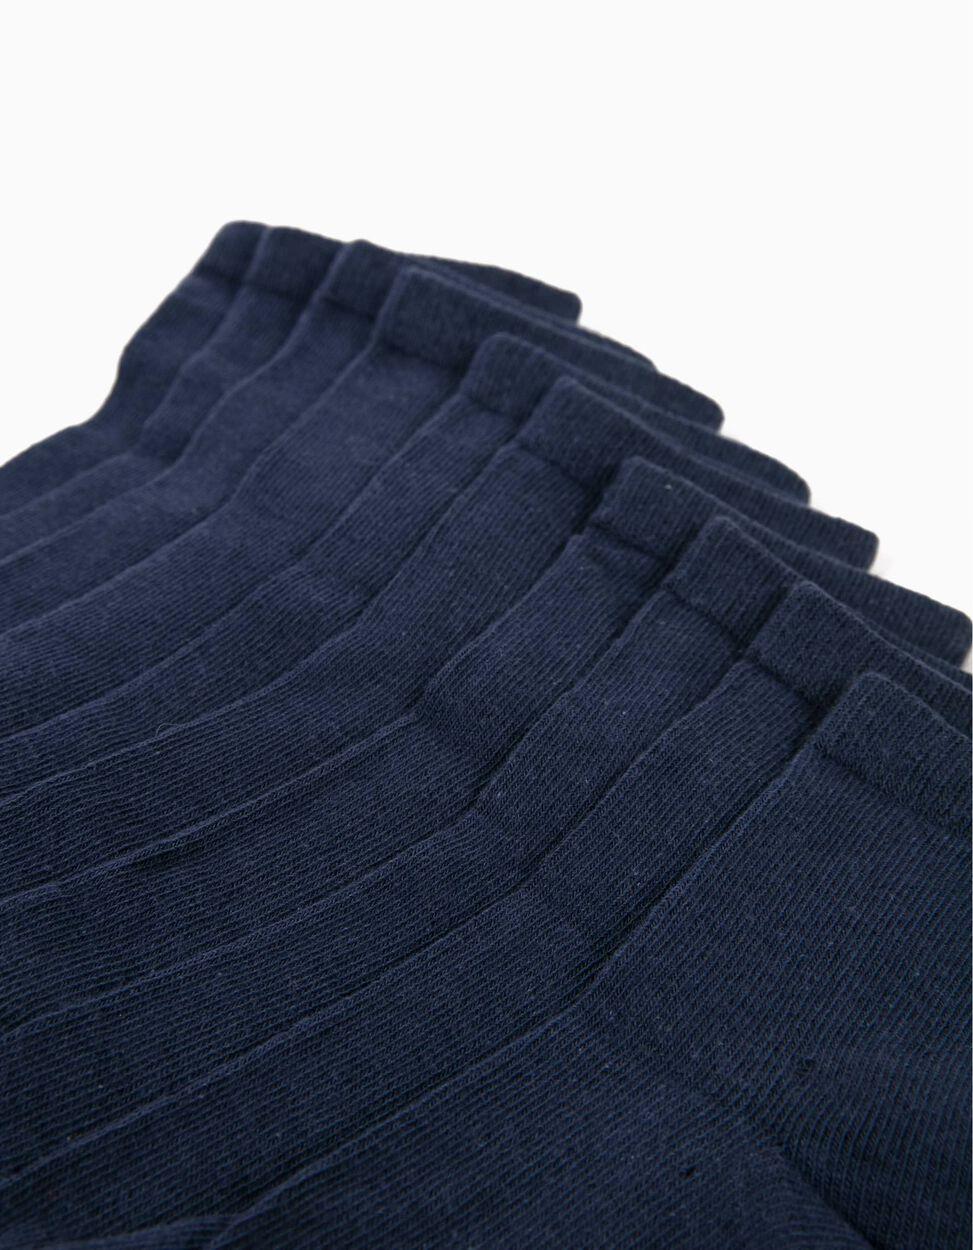 Pack 5 Pares de Calcetines Azules